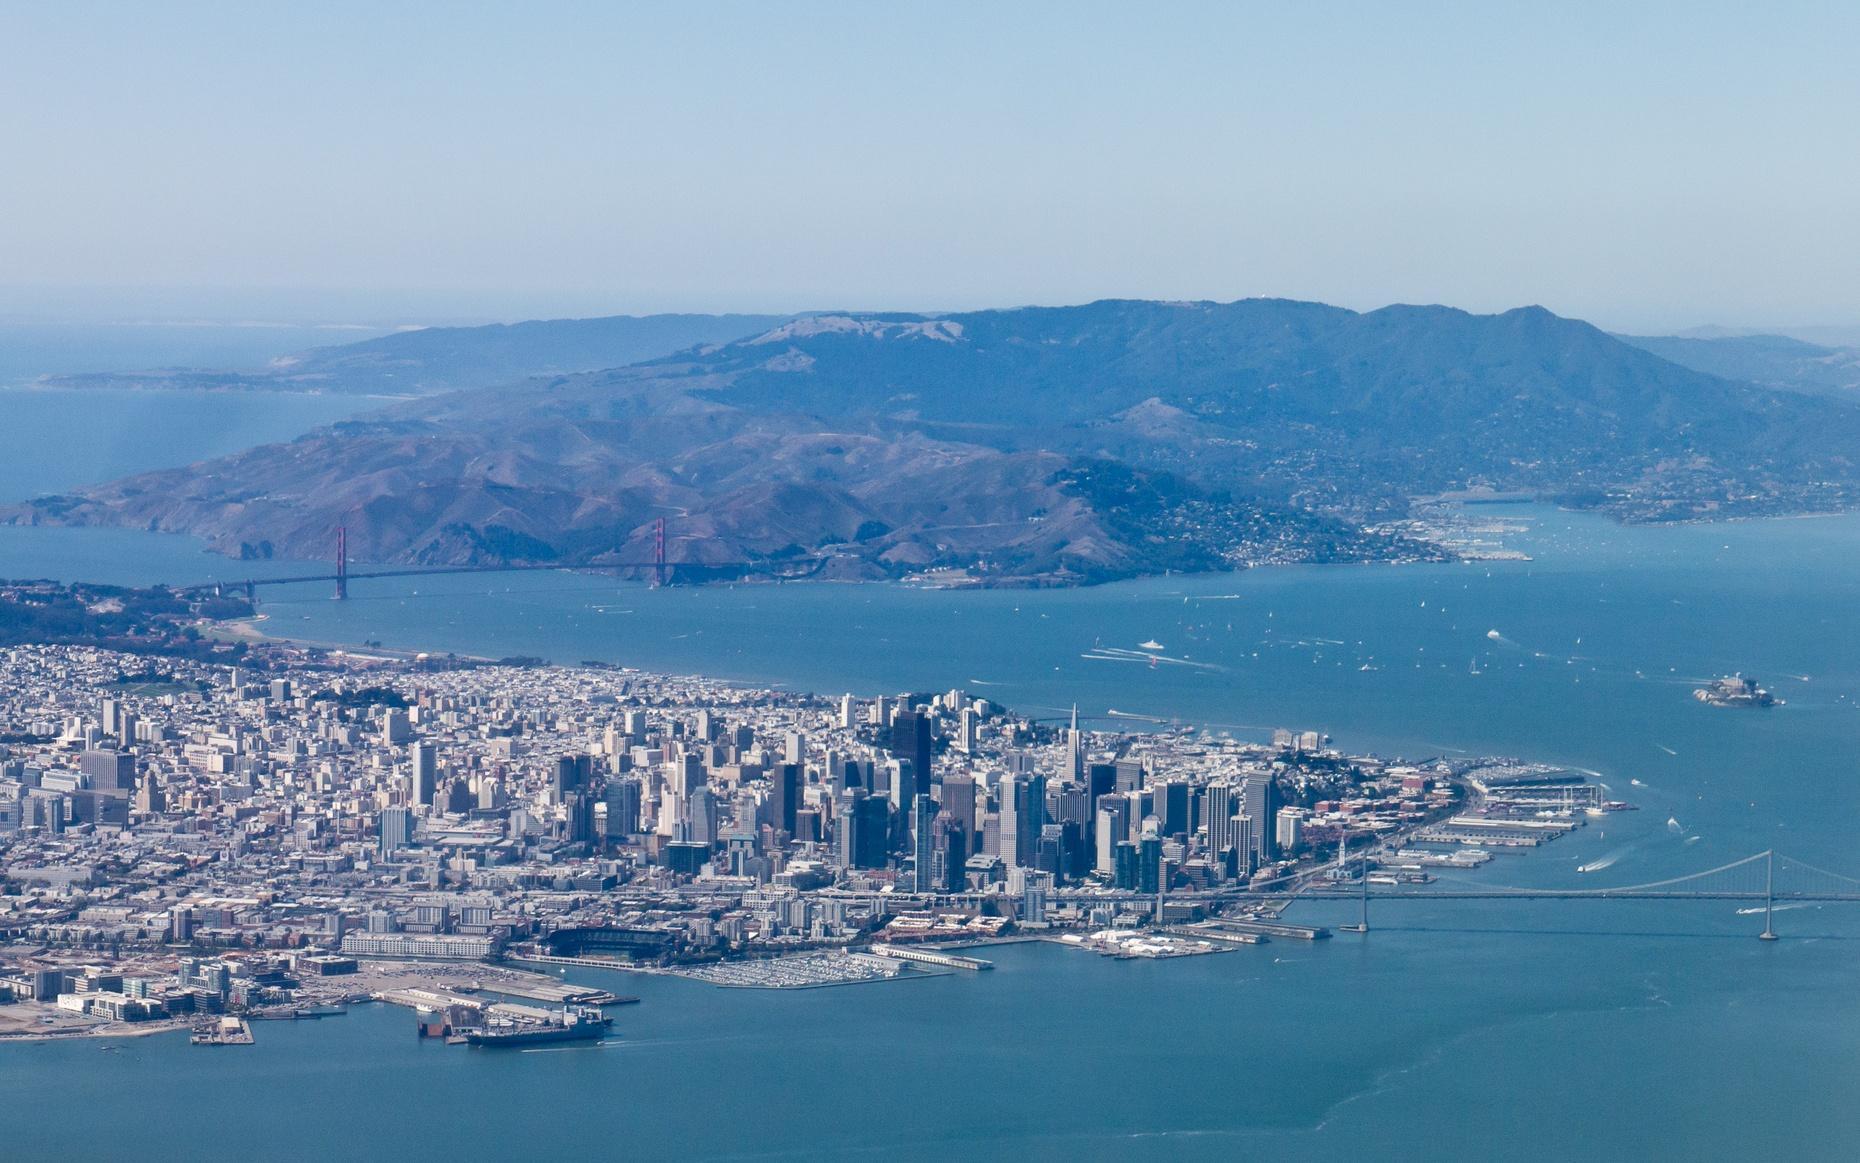 Santa Cruz Airport Shuttle to San Francisco